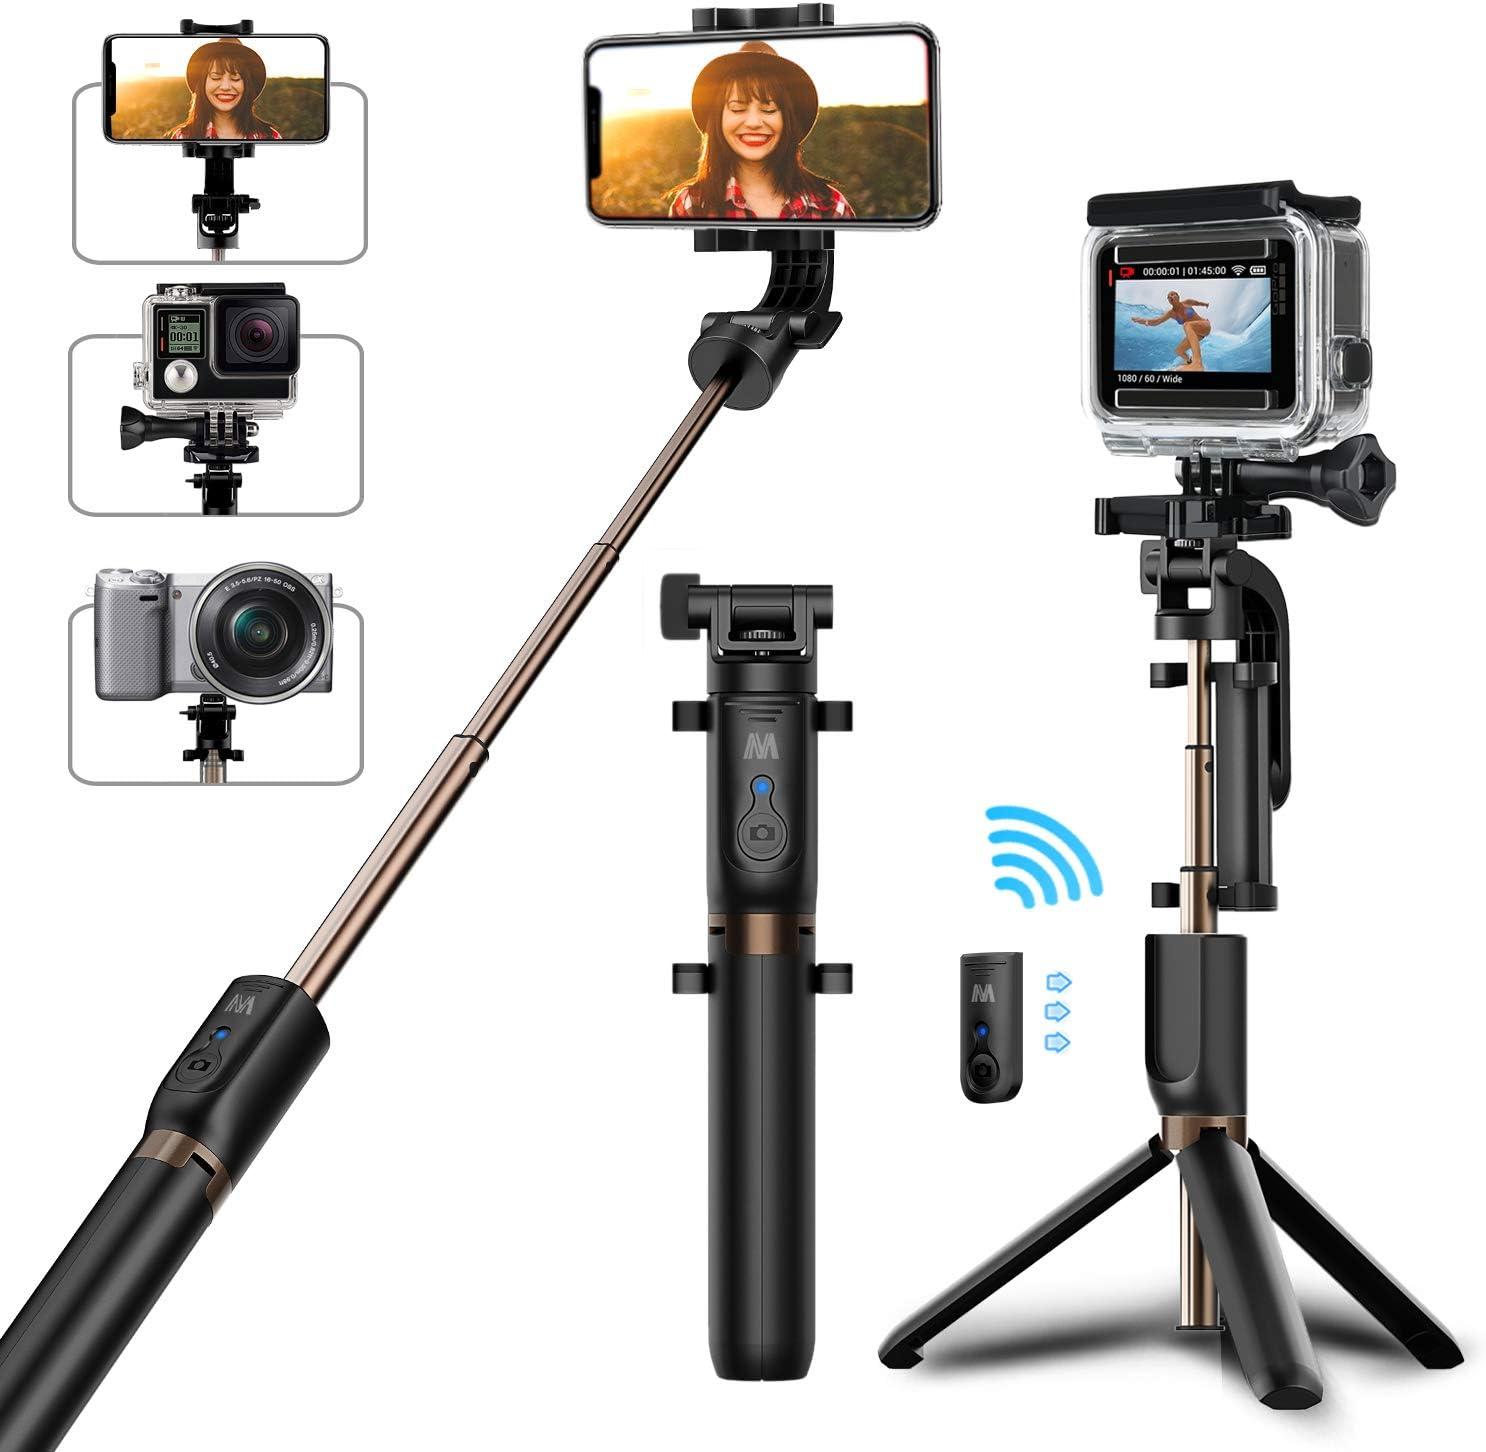 GoPro Sports Cameras Durable 2 in 1 Handheld Tripod Self-Portrait Monopod Selfie Stick for Smartphones Digital Cameras